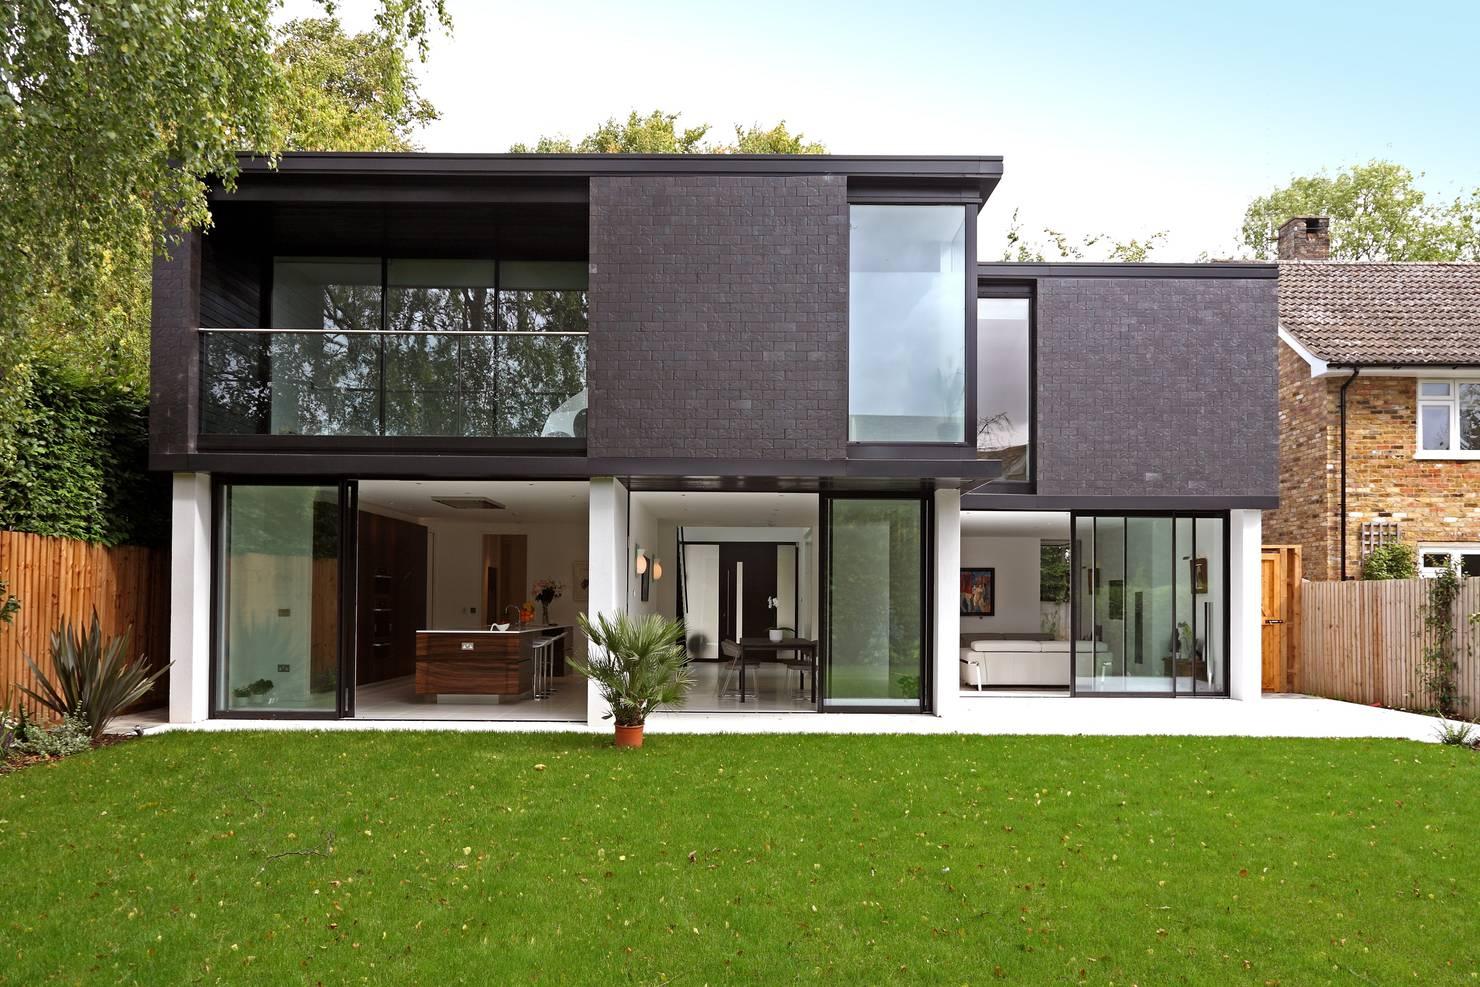 The Modern Home of Peaceful Elegance